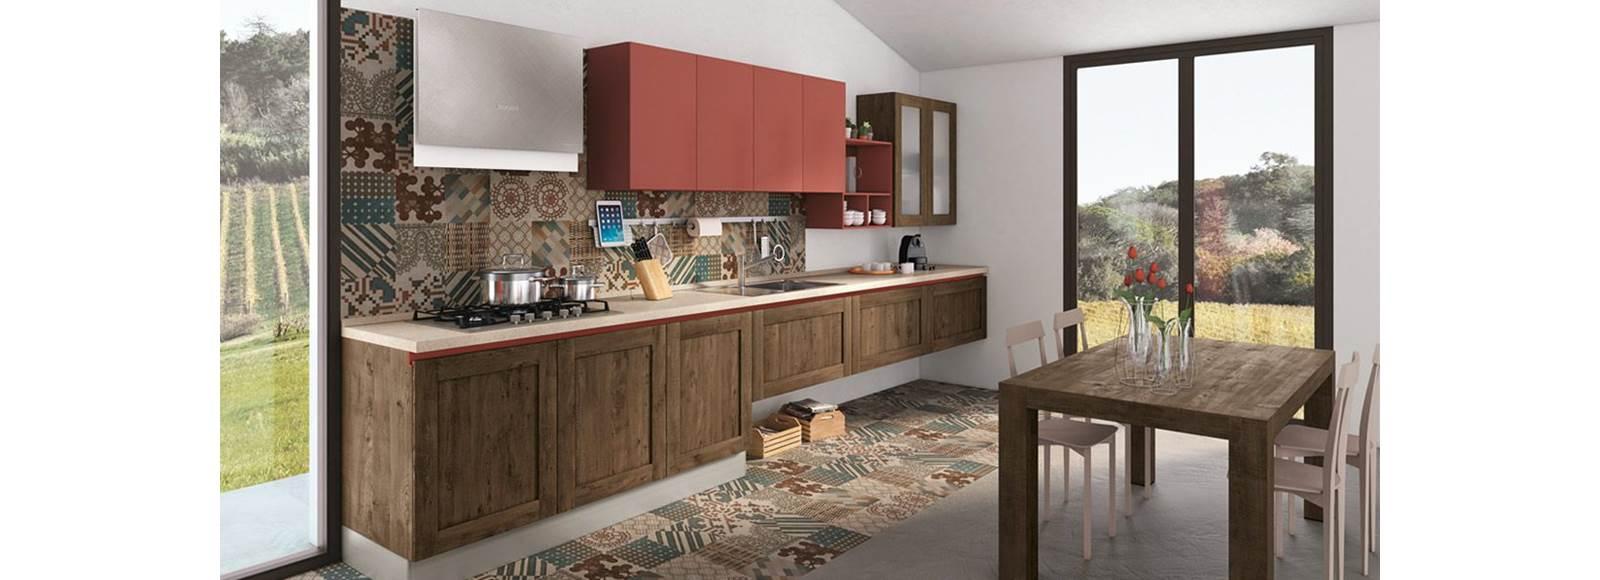 Cucina Creo Kitchens - KYRA TELAIO